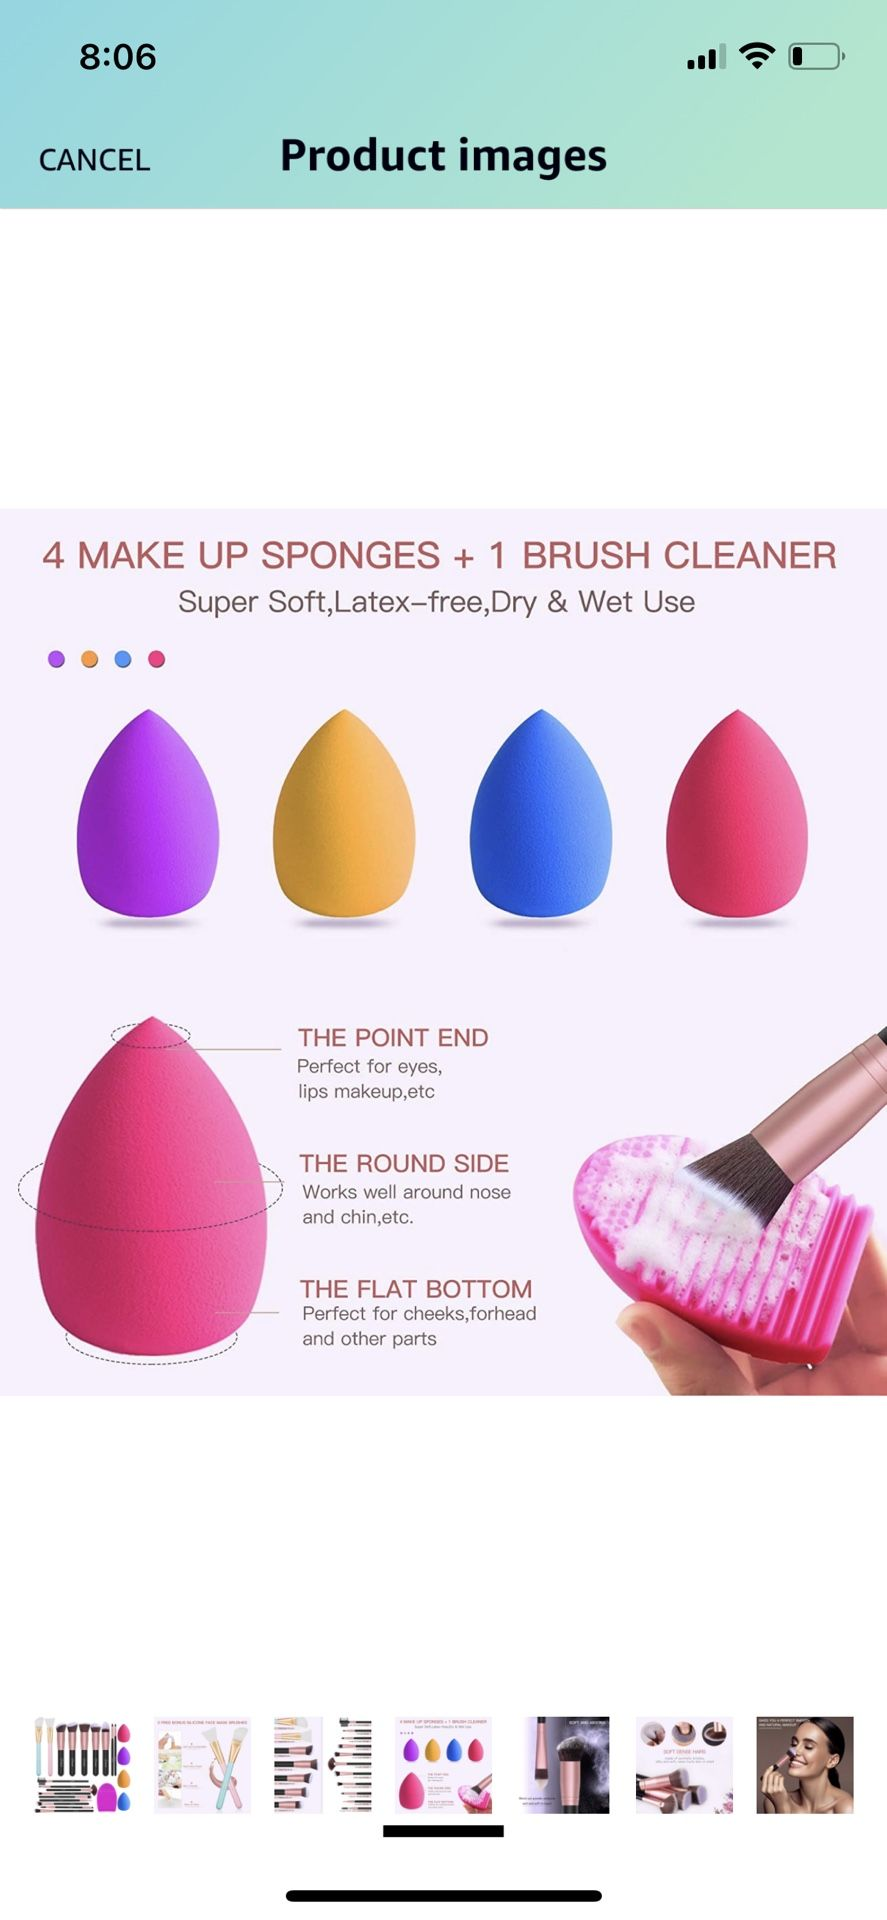 BESTOPE Makeup Brushes 16Pcs Professional Makeup Brush Set 2 Silicone Face Mask Brushes&4 Blender Sponge&1 Brush Cleaner Premium Synthetic Foundation